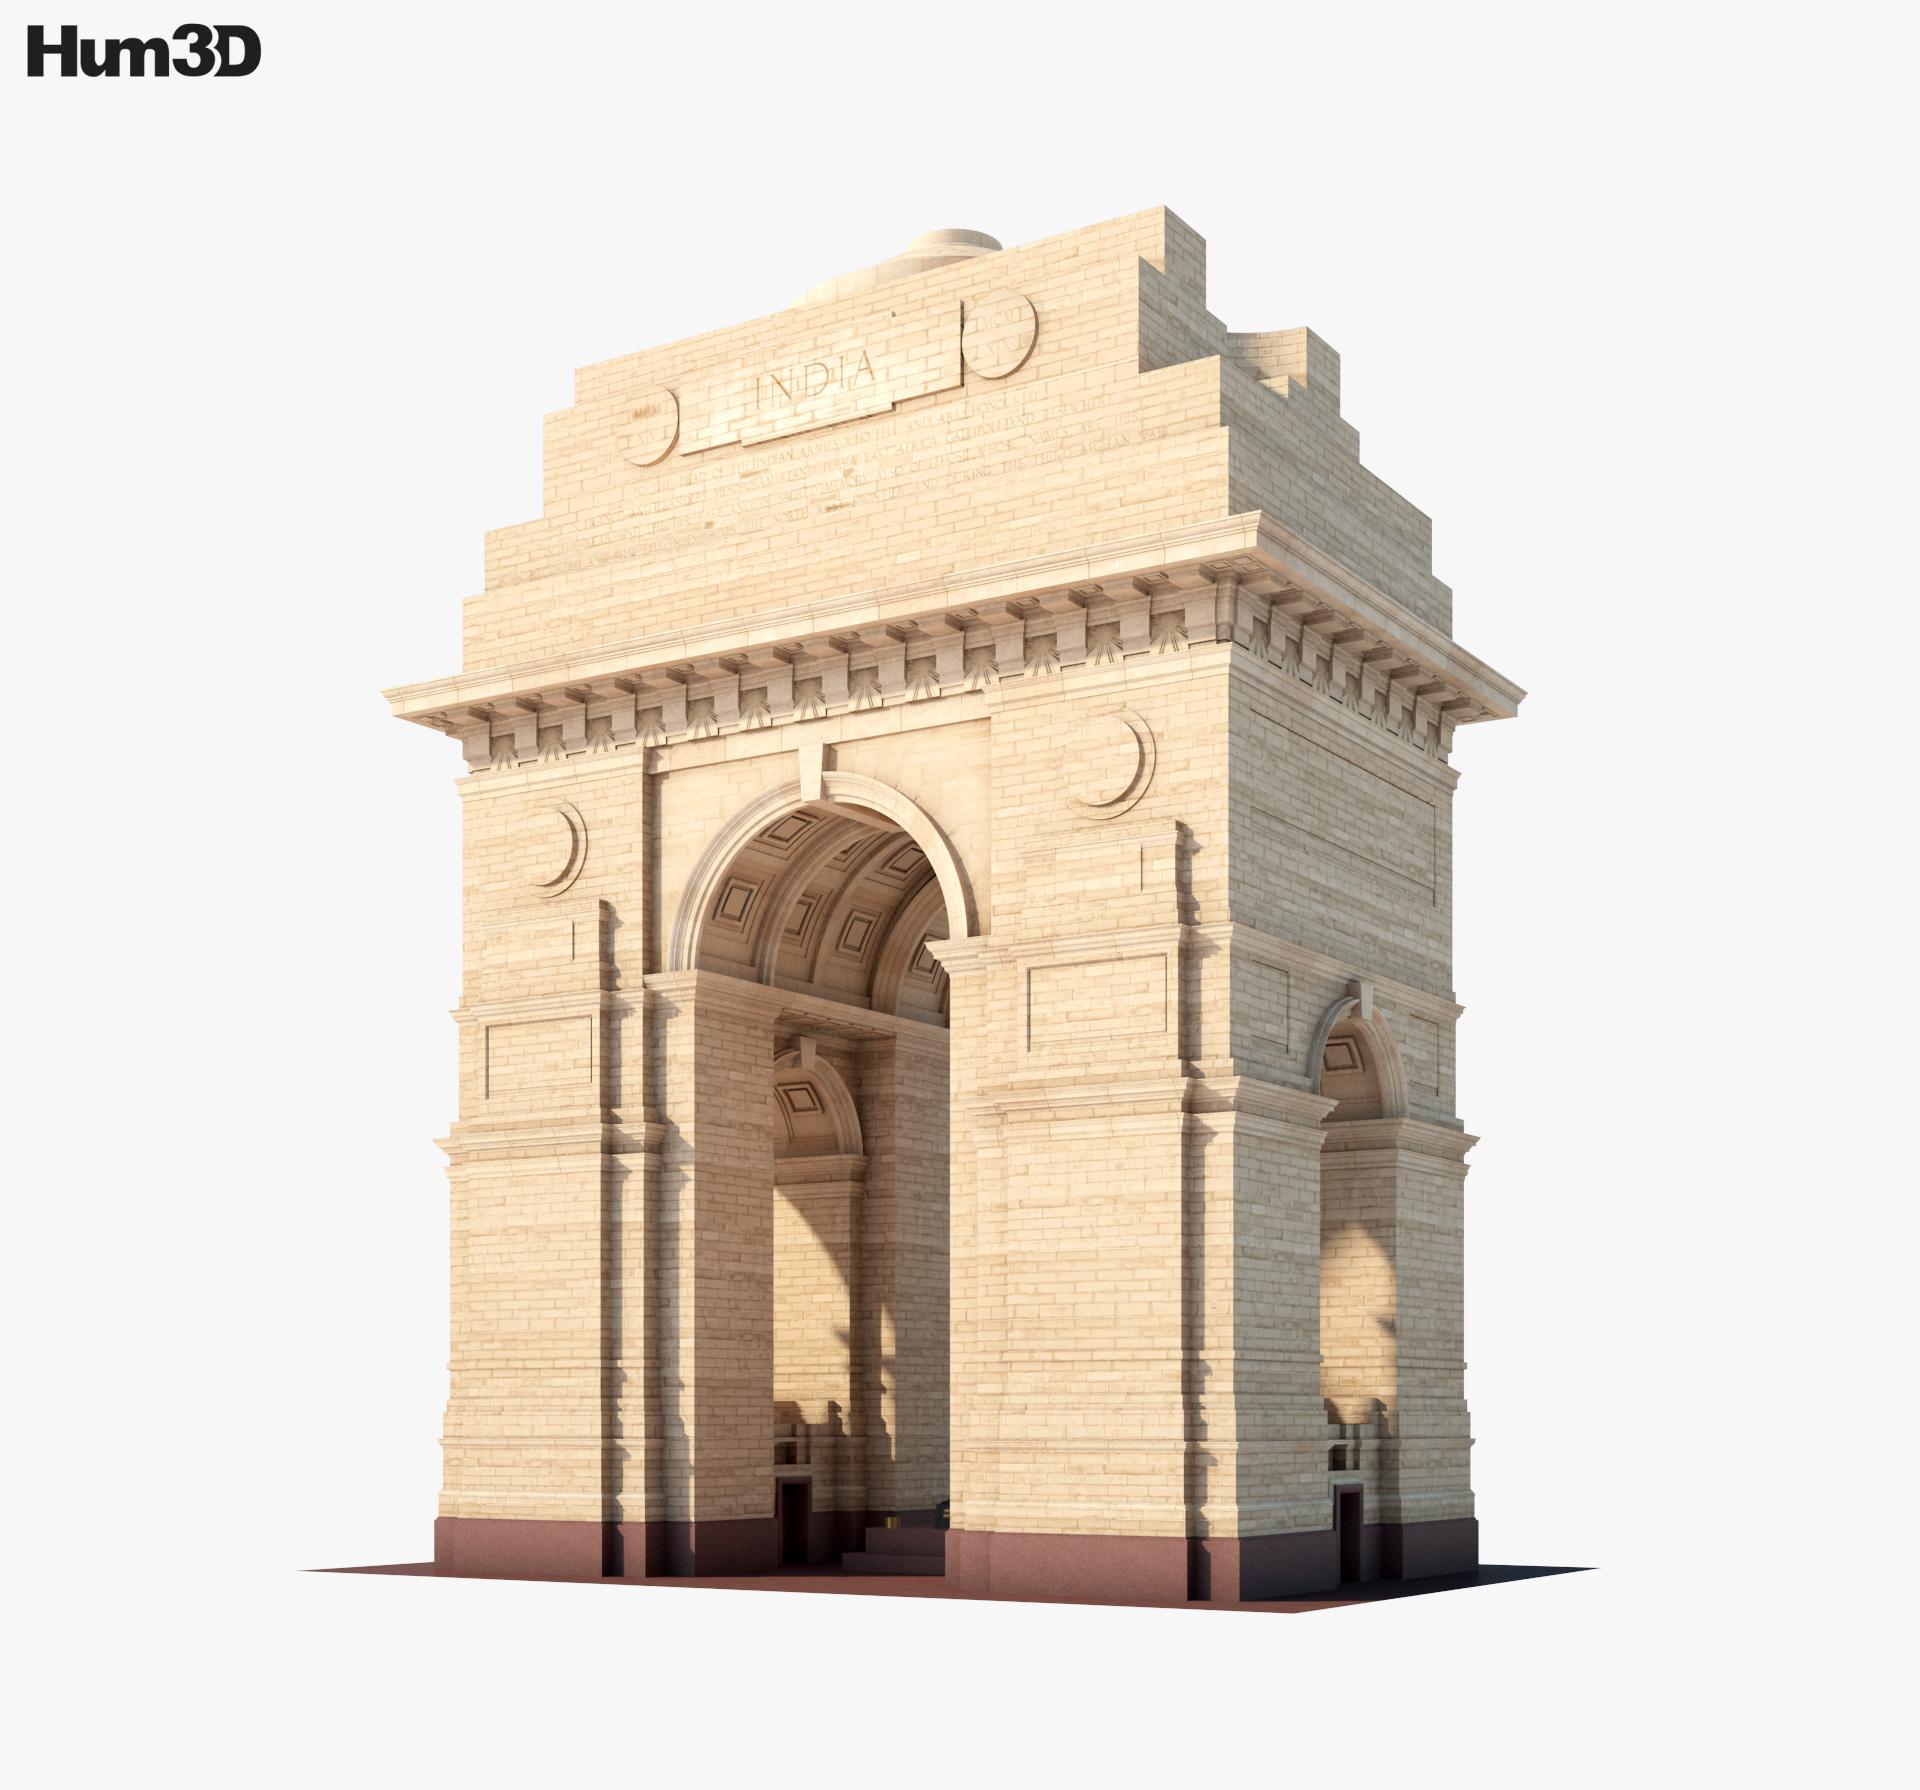 India Gate 3d model